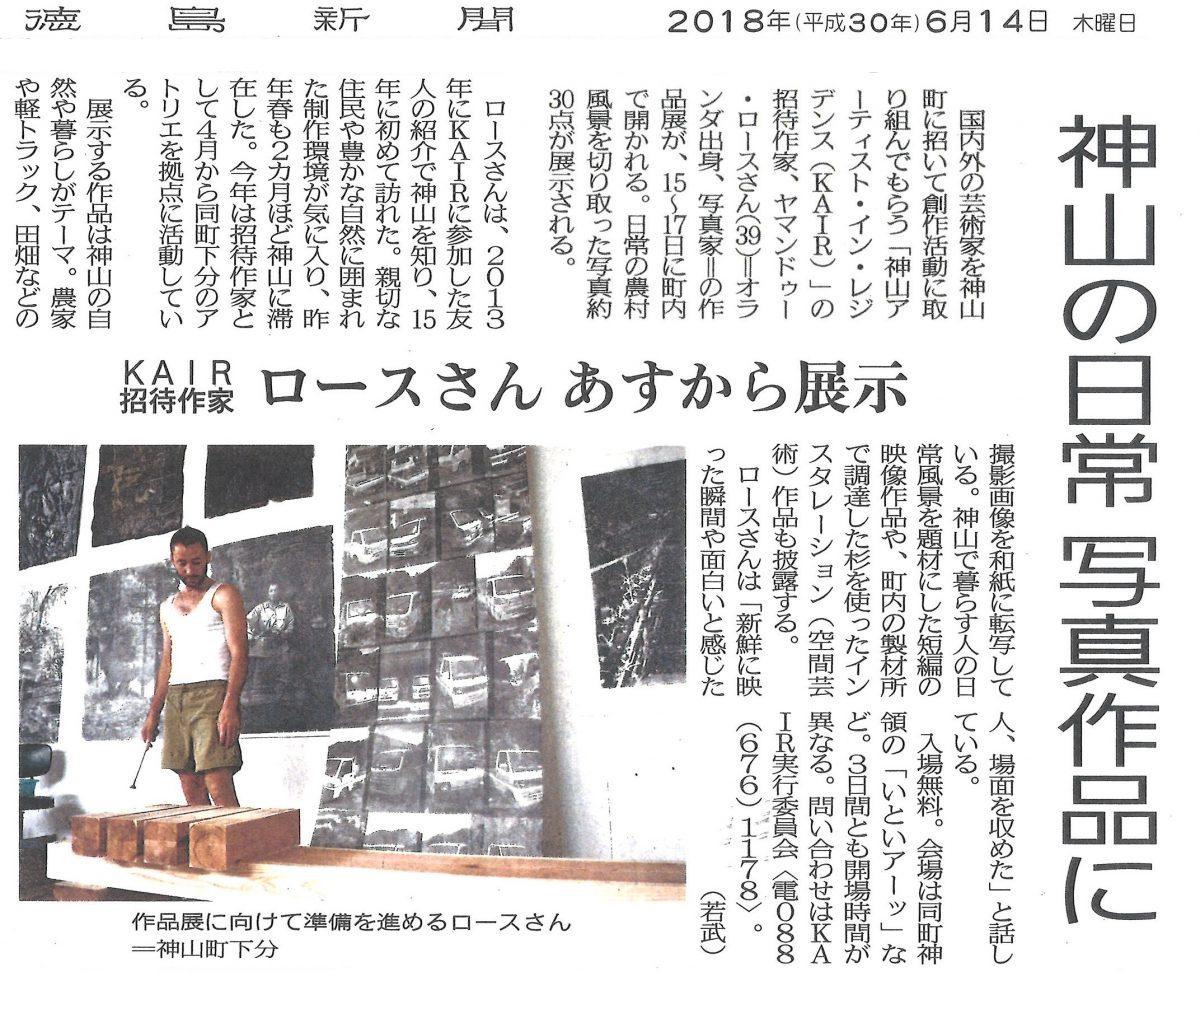 "6/15-6/17 KAIR2018春プログラム""Yamandu Roos Artworks作品展"" ご覧ください!"